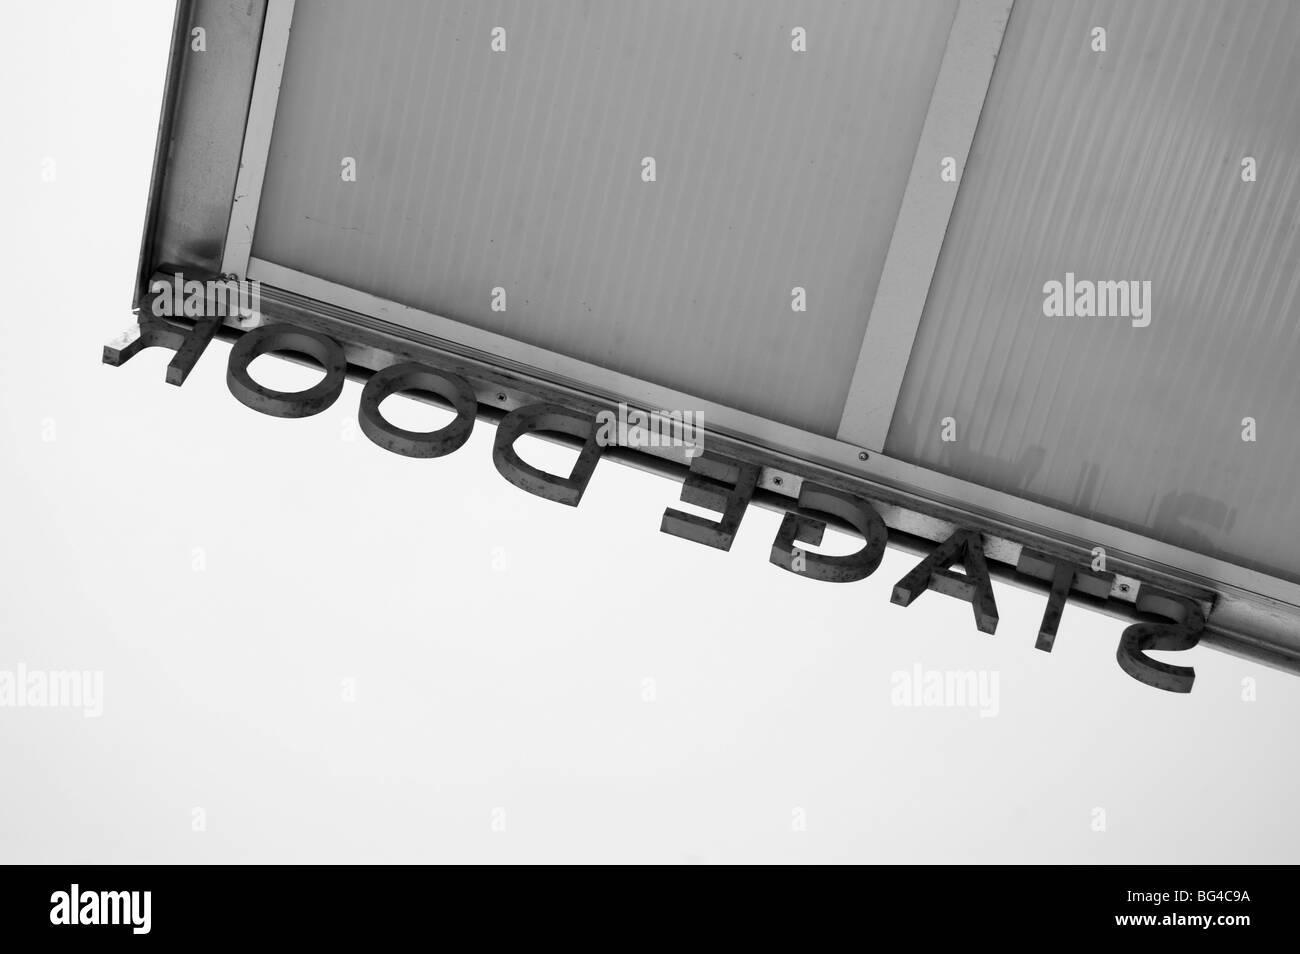 Theatre Door Black and White Stock Photos & Images - Alamy